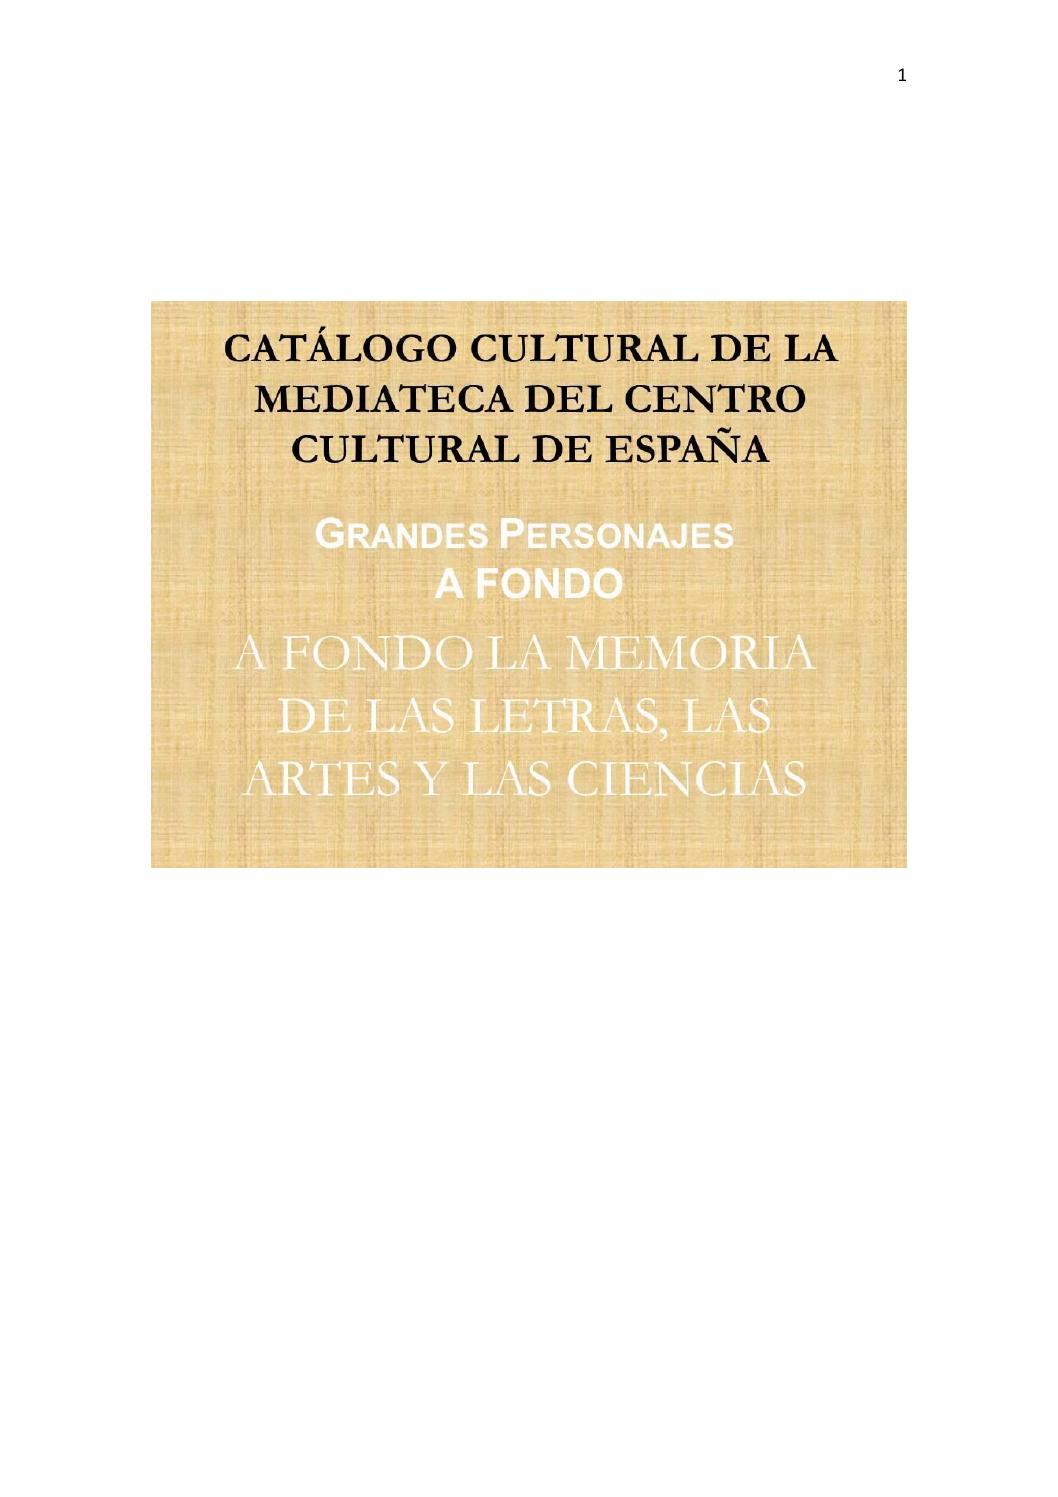 Catálogo mediateca : Grandes personajes a fondo by CCE Santiago - issuu